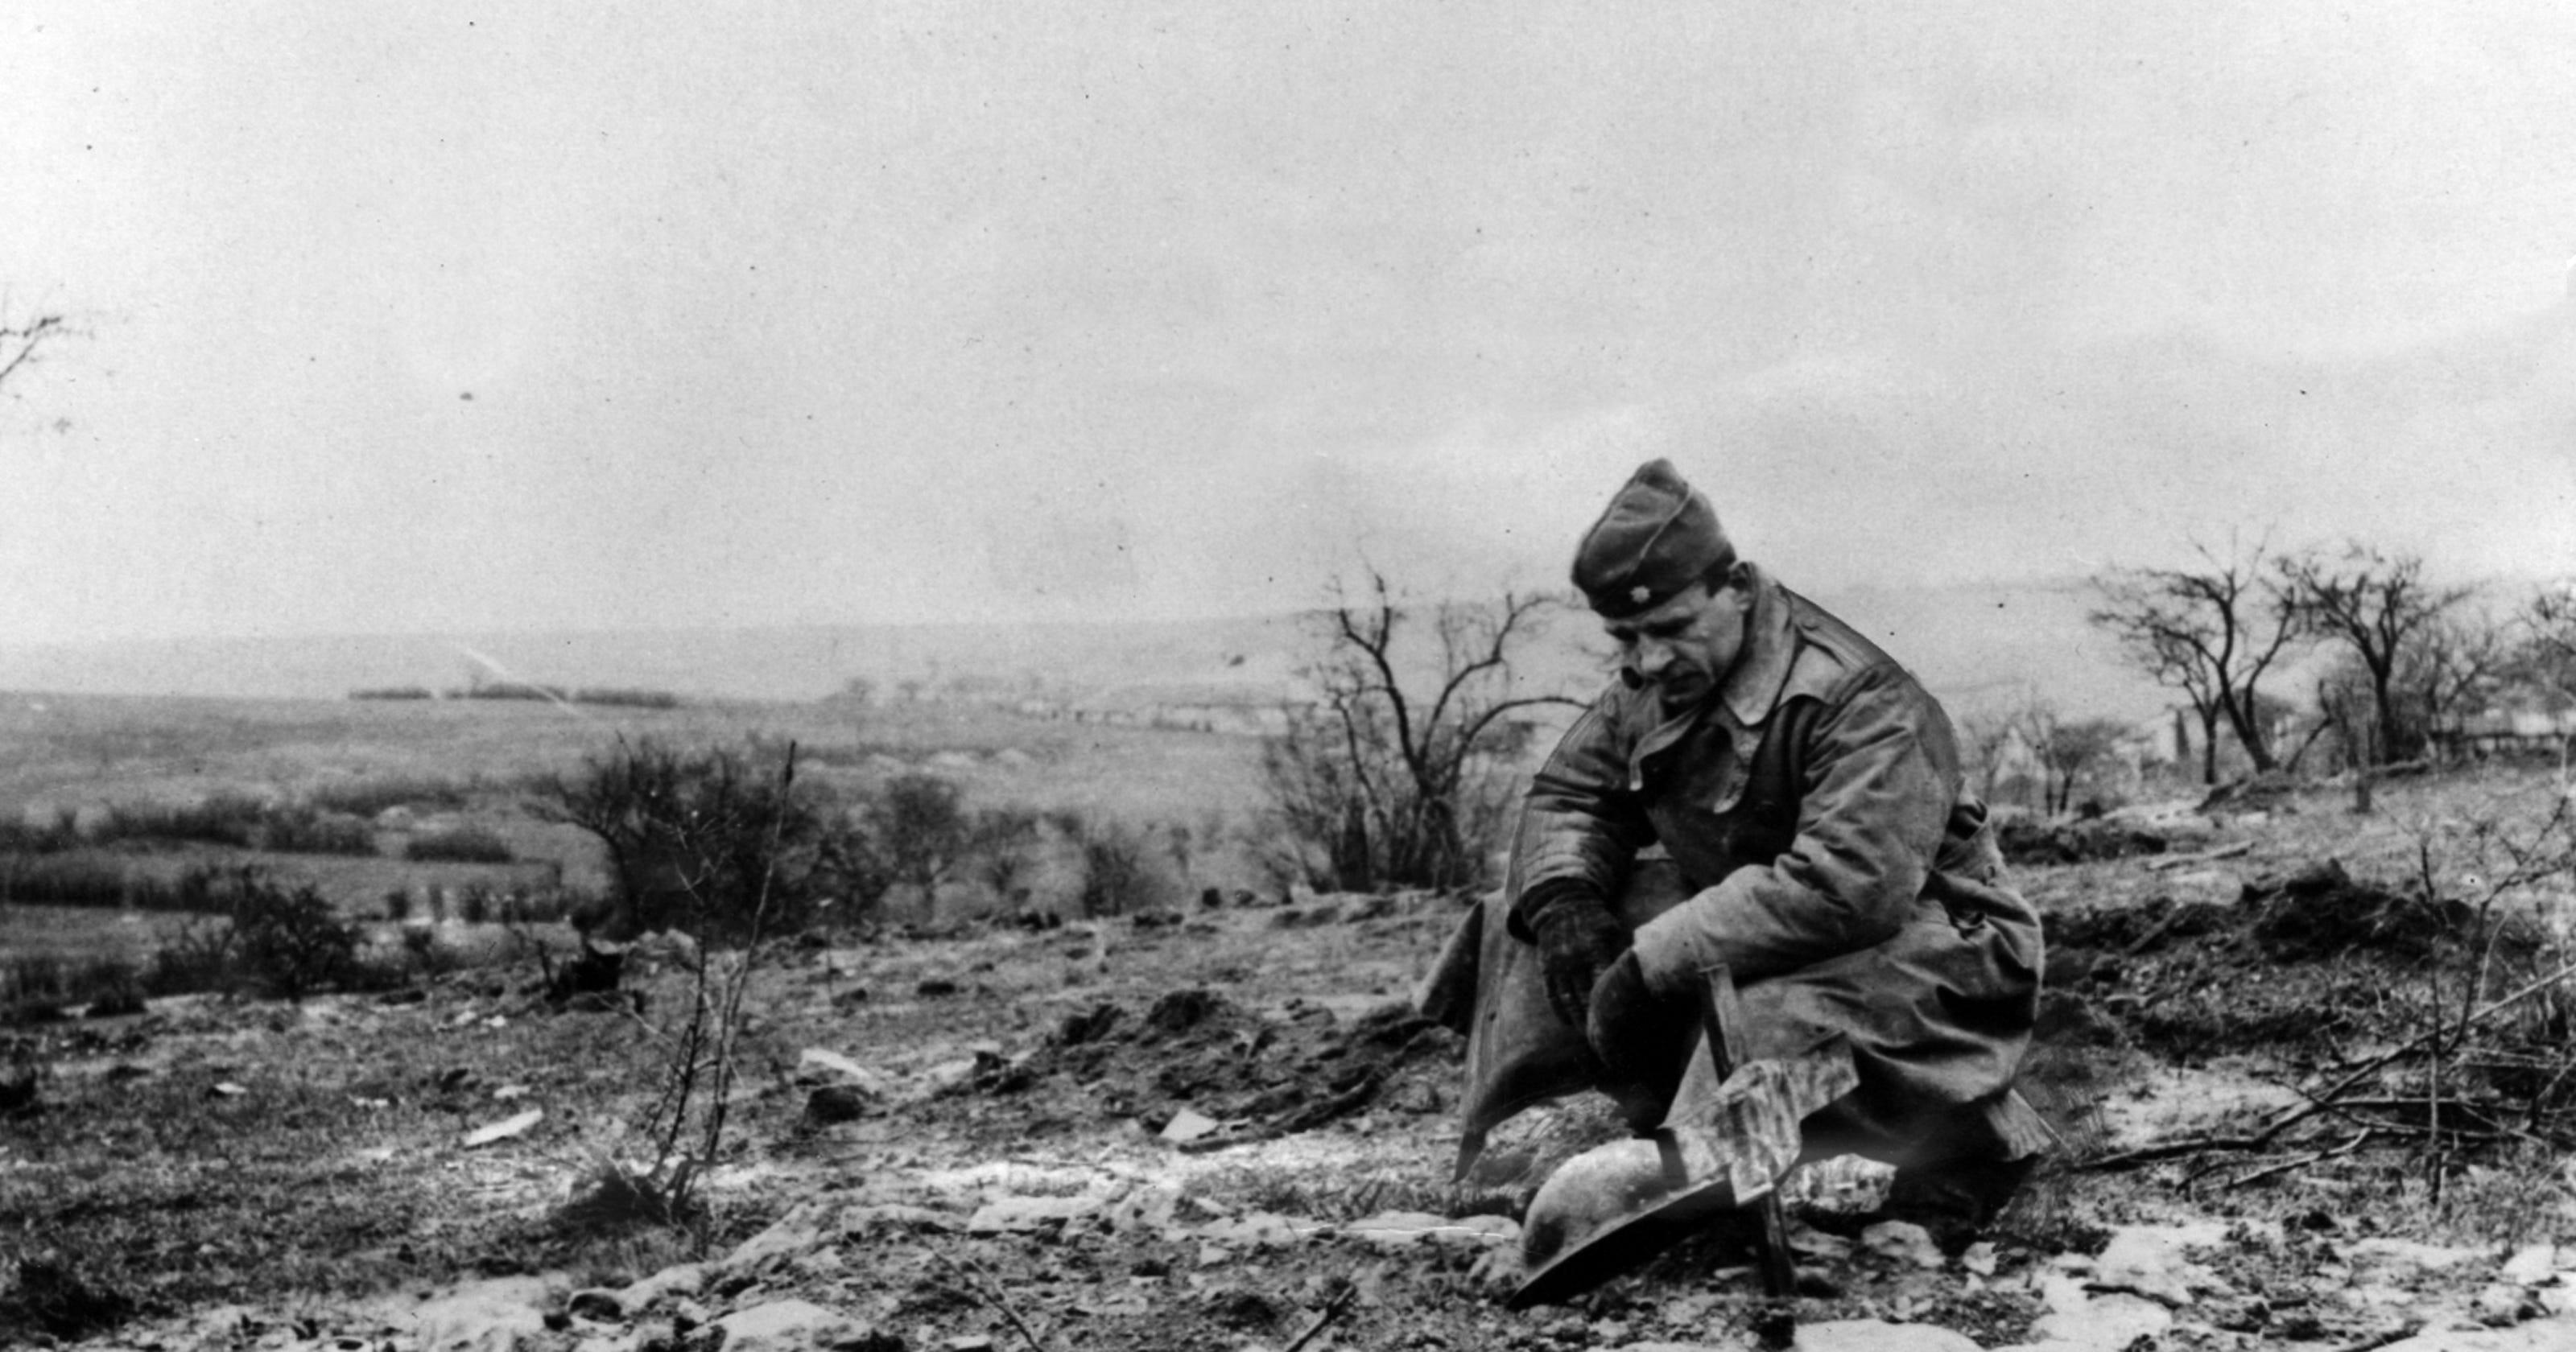 Impact of World War I felt around Cincinnati